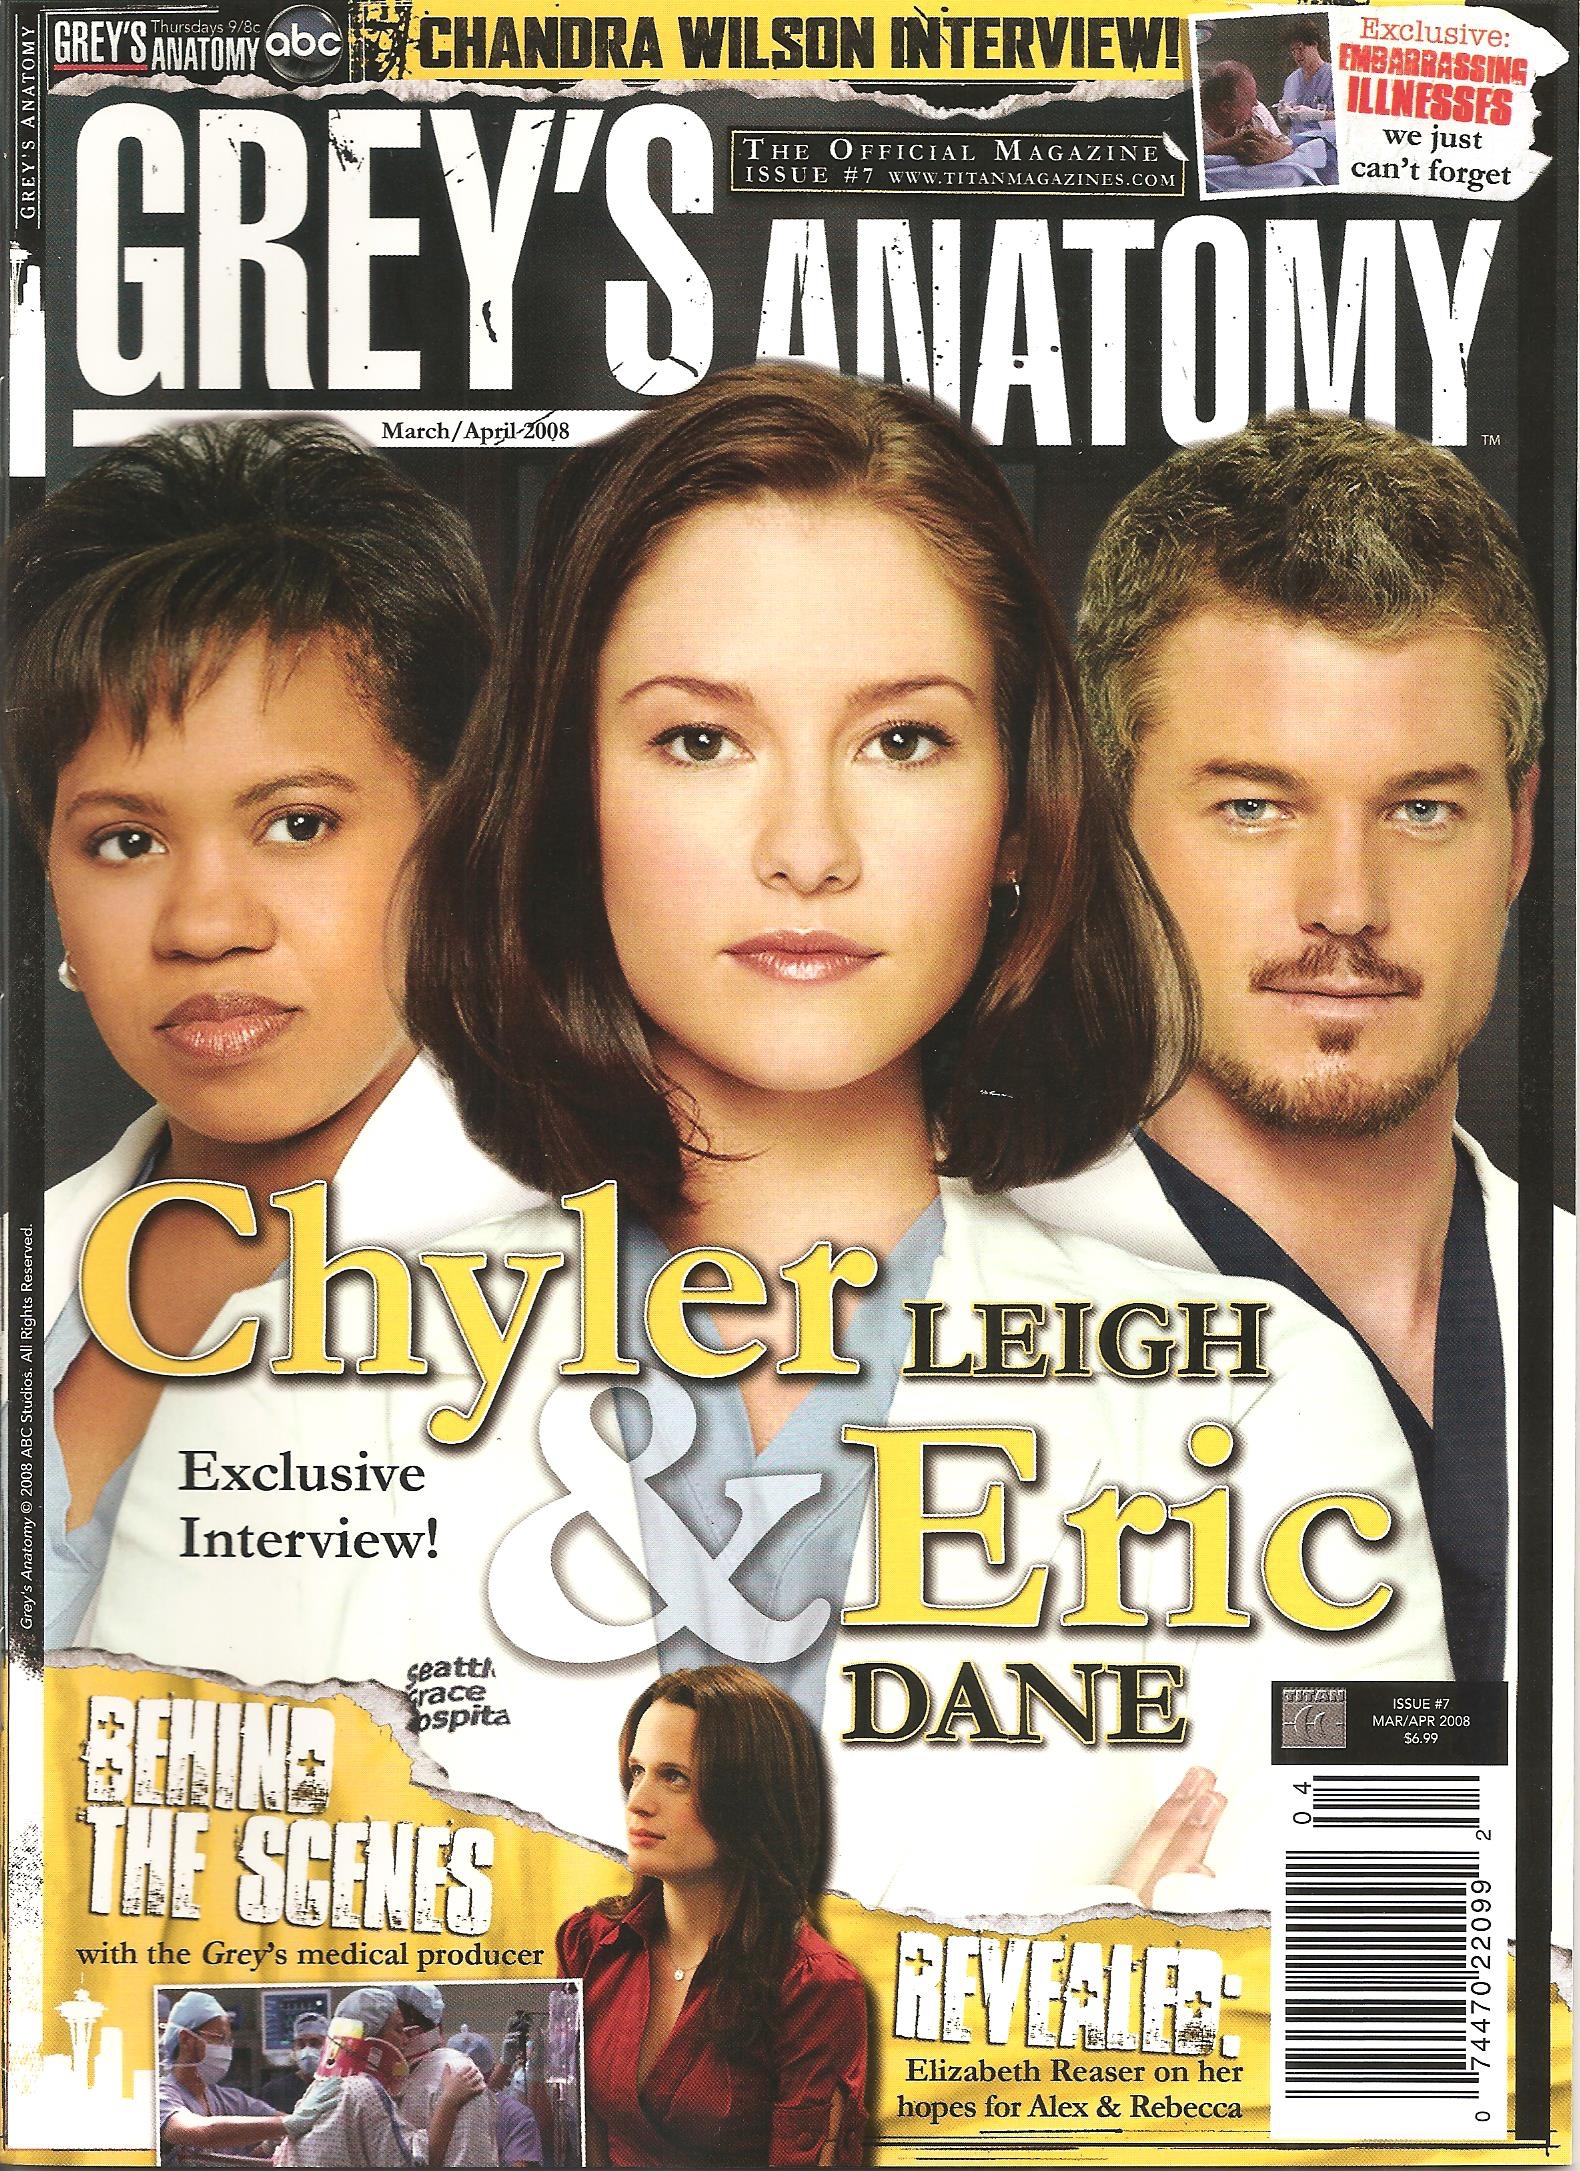 Grey\'s Anatomy Official Magazine: Issue 7 | Grey\'s Anatomy Universe ...